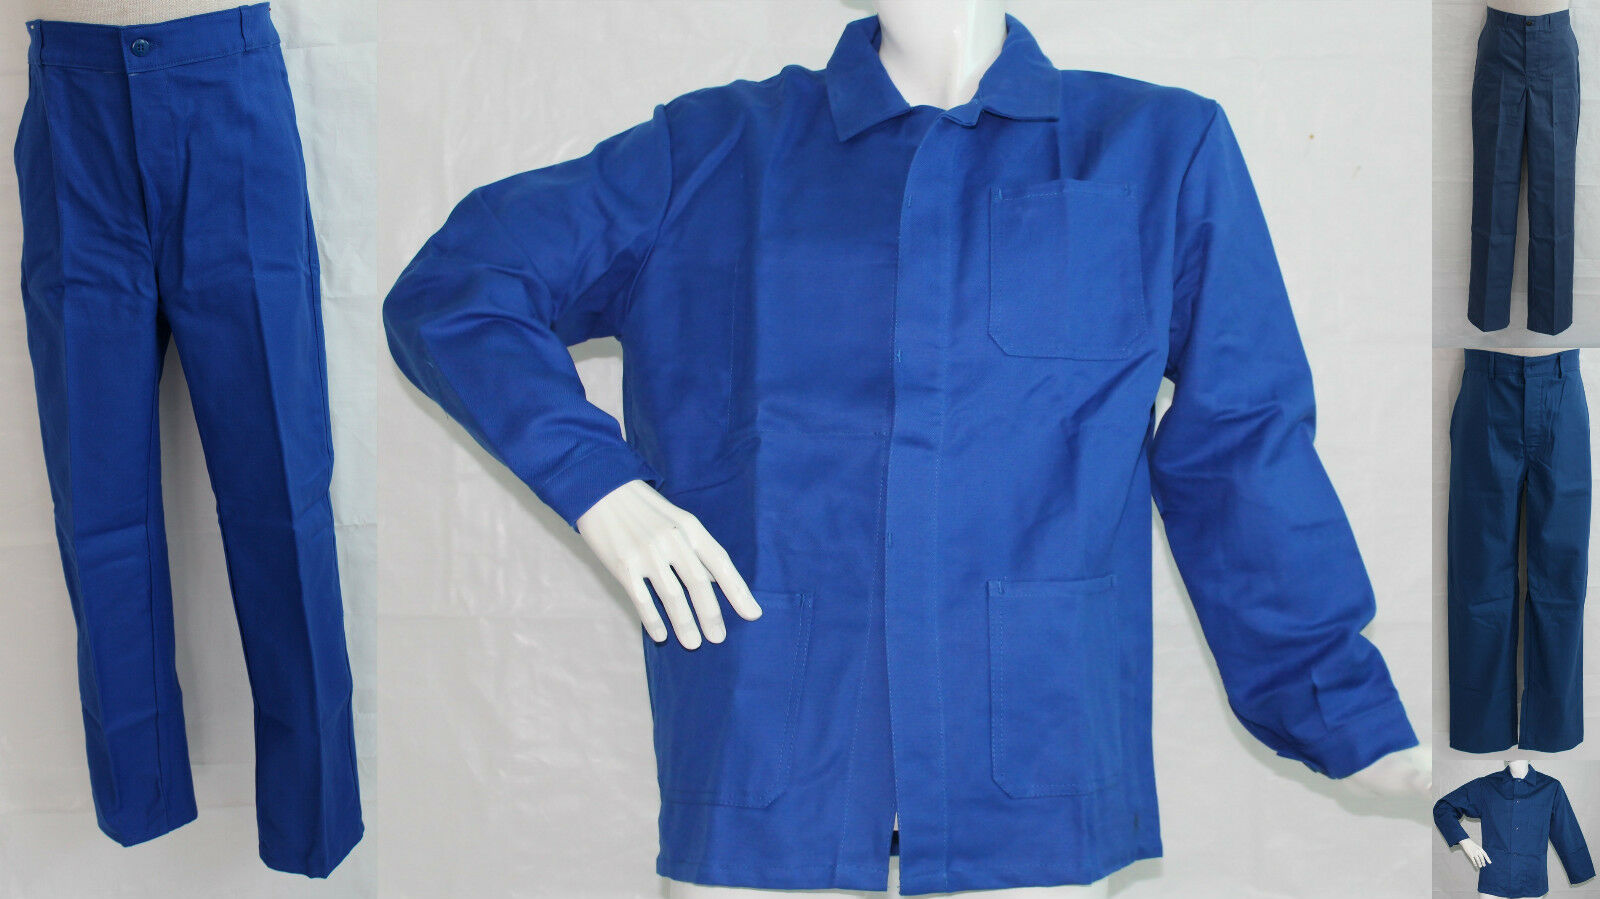 Arbeitskleidung Arbeitsjacke Arbeitshose Bundhose Berufskleidung